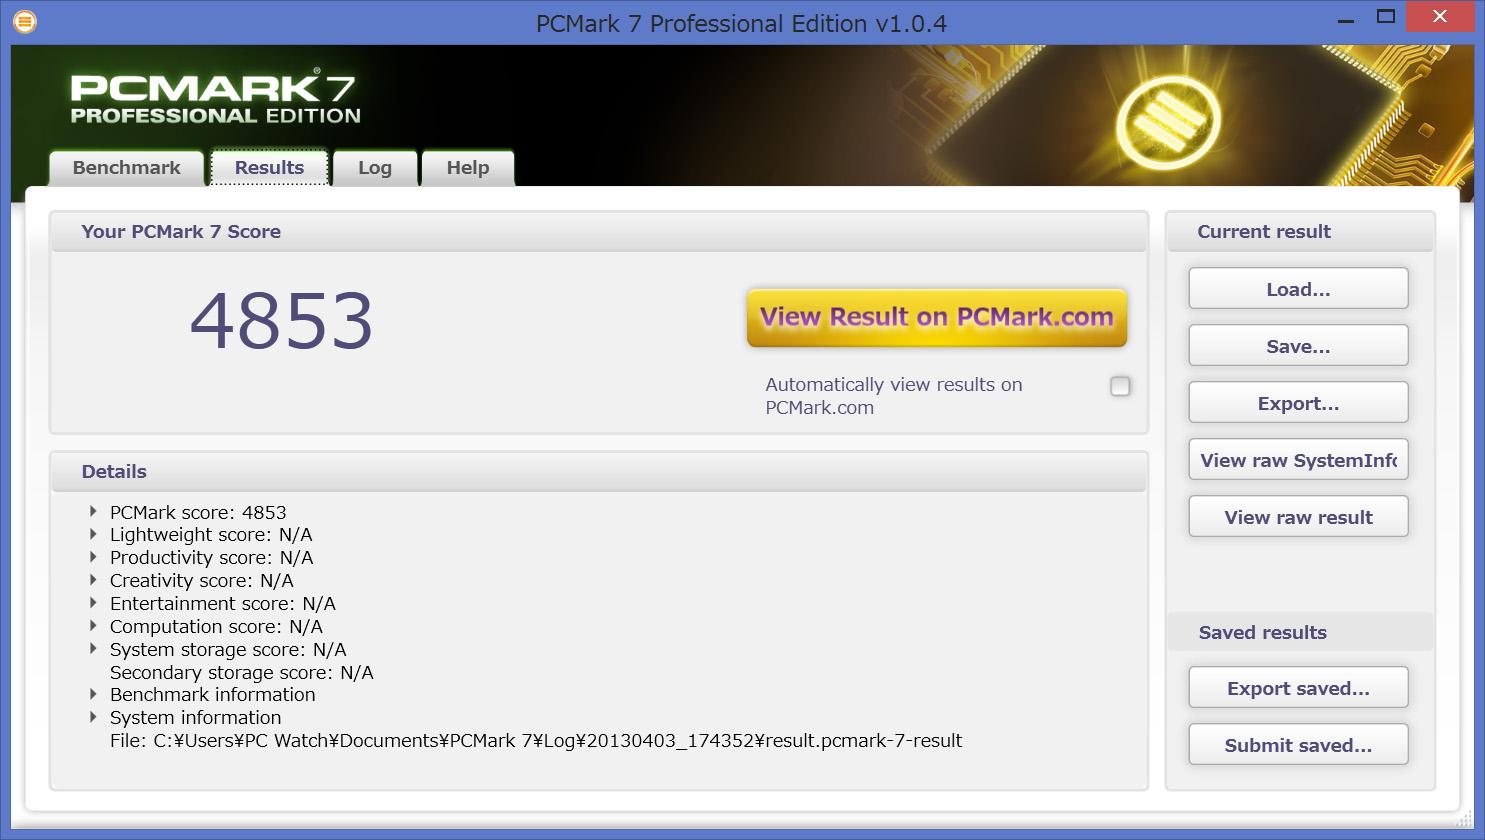 PCMark 7は4853 PCMarks